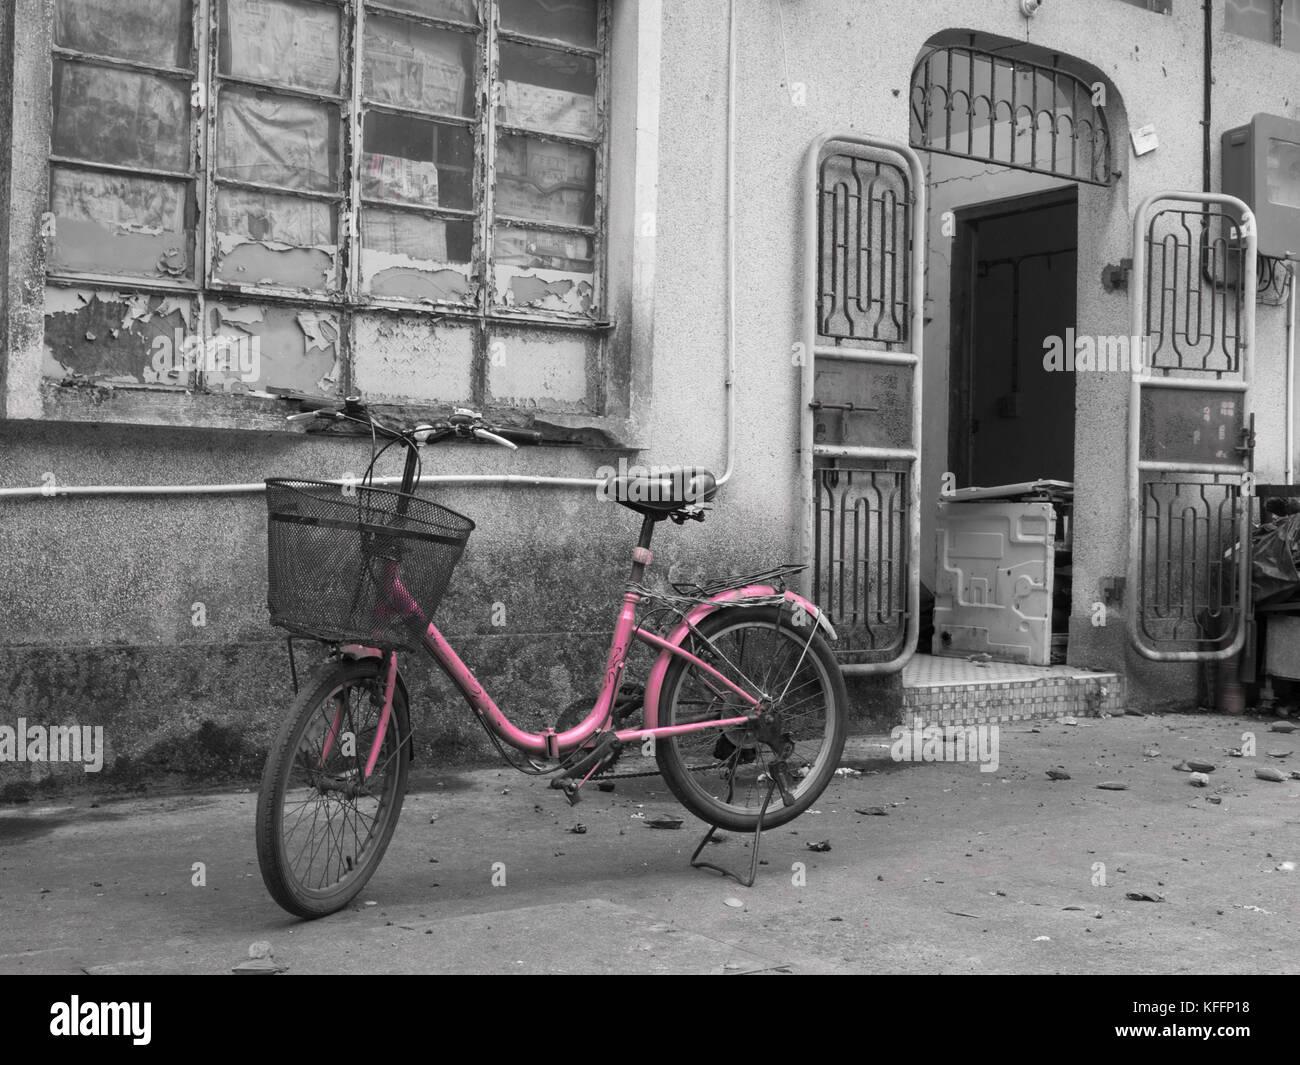 Pink Ladies bicycle outside premises at Tai O fishing village, Lantau Island, Hong Kong, China. - Stock Image